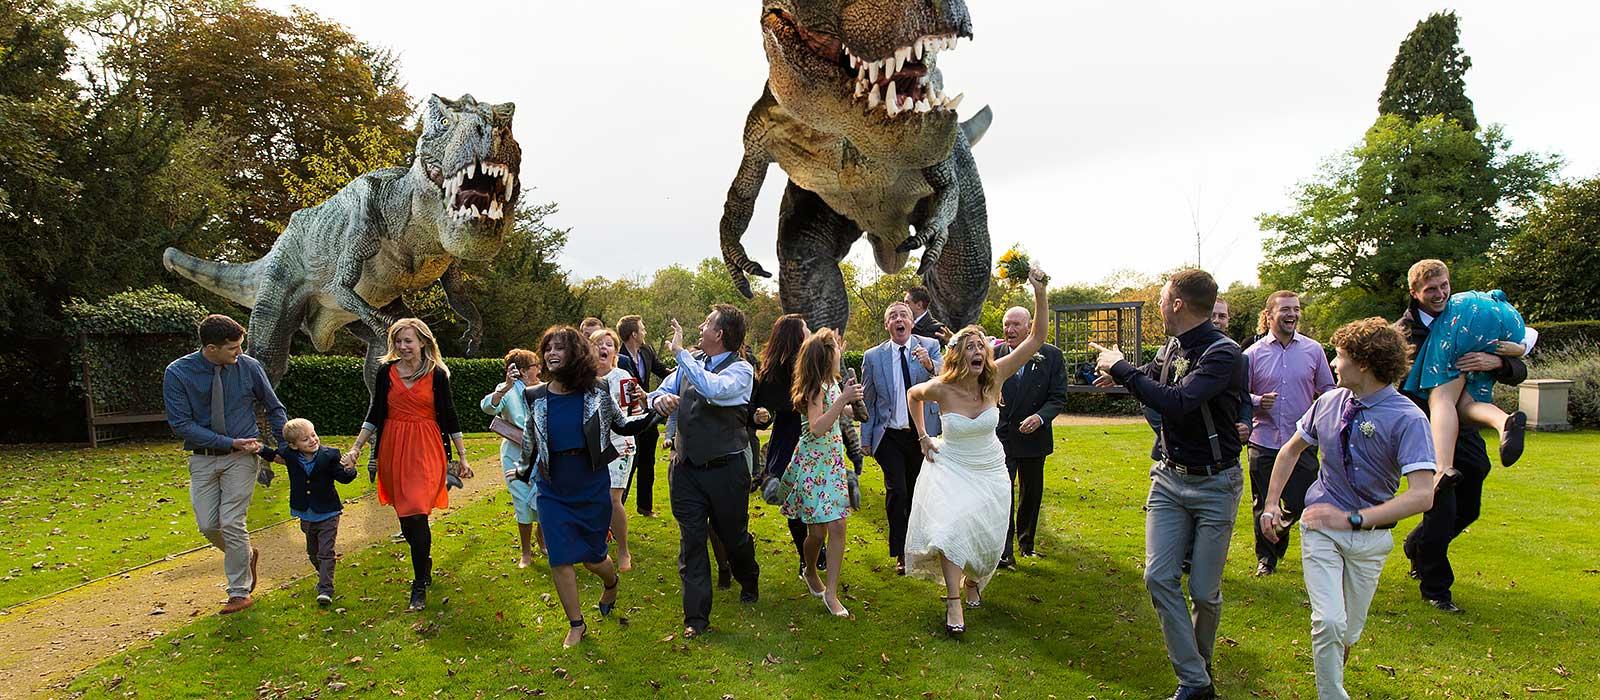 Leatherhead register office wedding | Lindsey & Drew